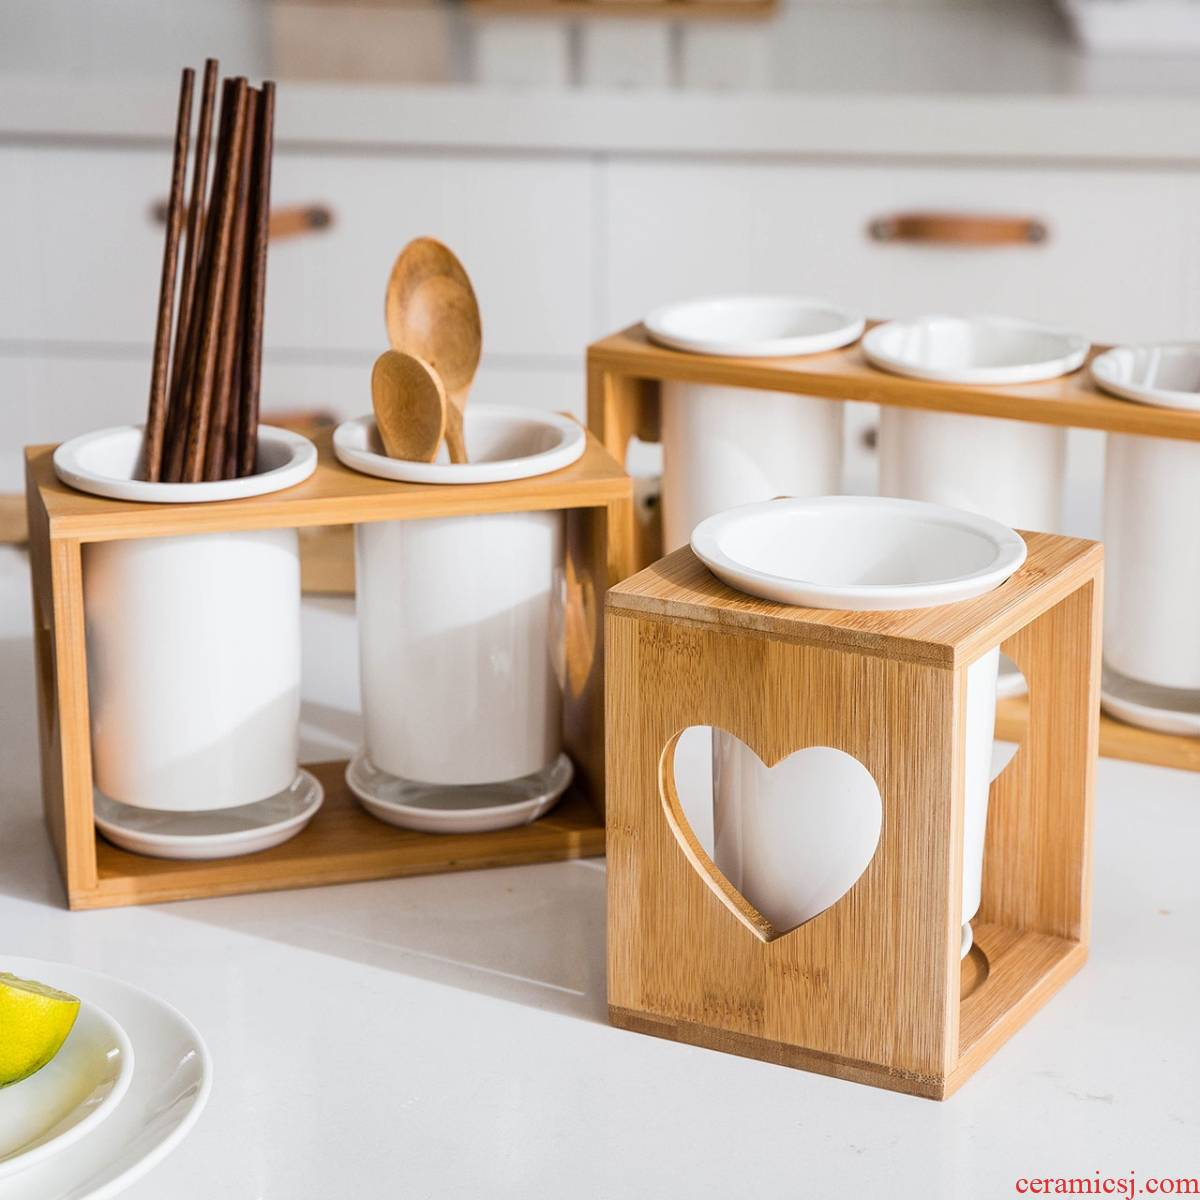 The List of guest kitchen chopsticks chopsticks spoons receive home ceramic drop tube basket rack shelf chopsticks chopsticks